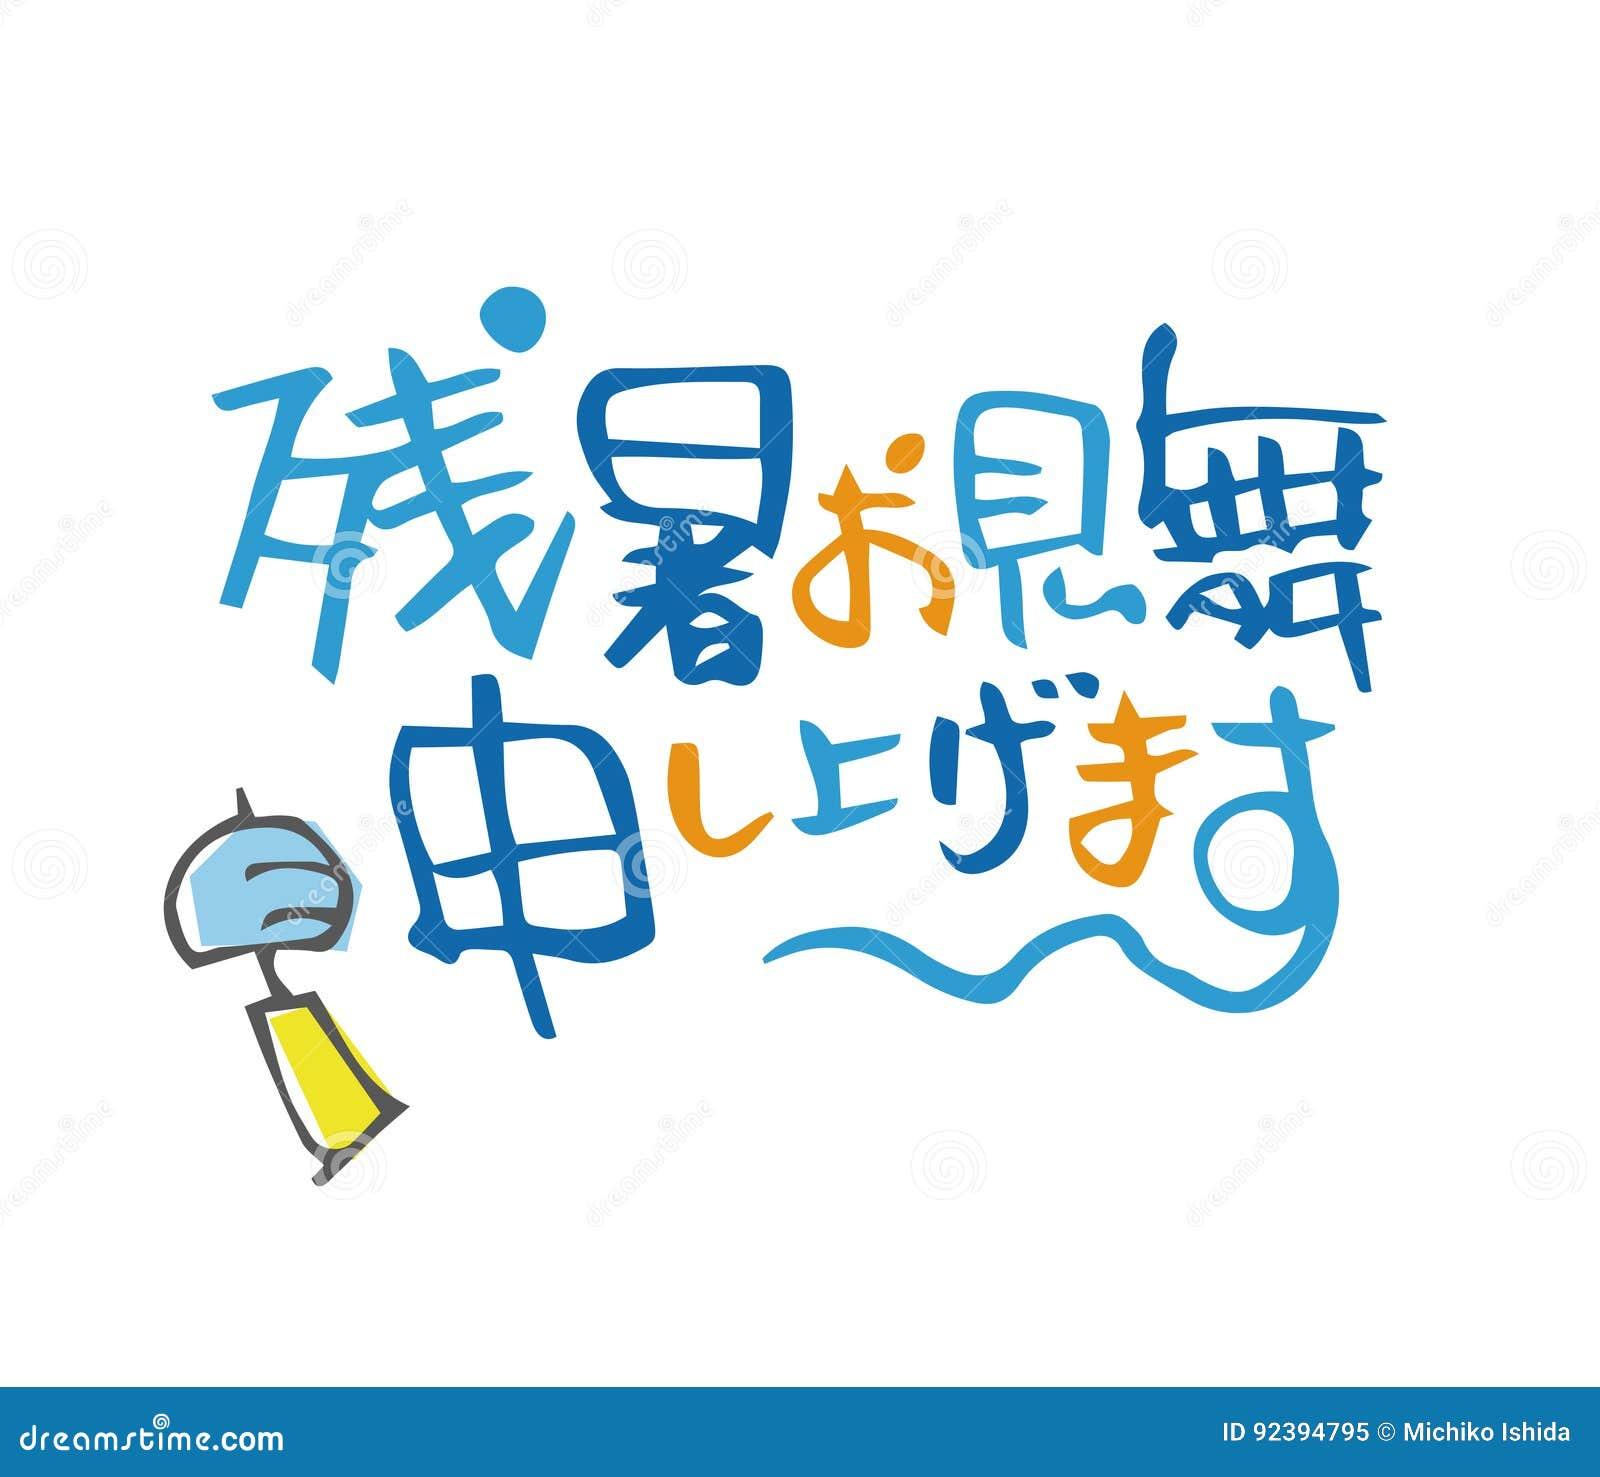 Brush Stroke Of Summer Greeting Words Stock Vector Illustration Of